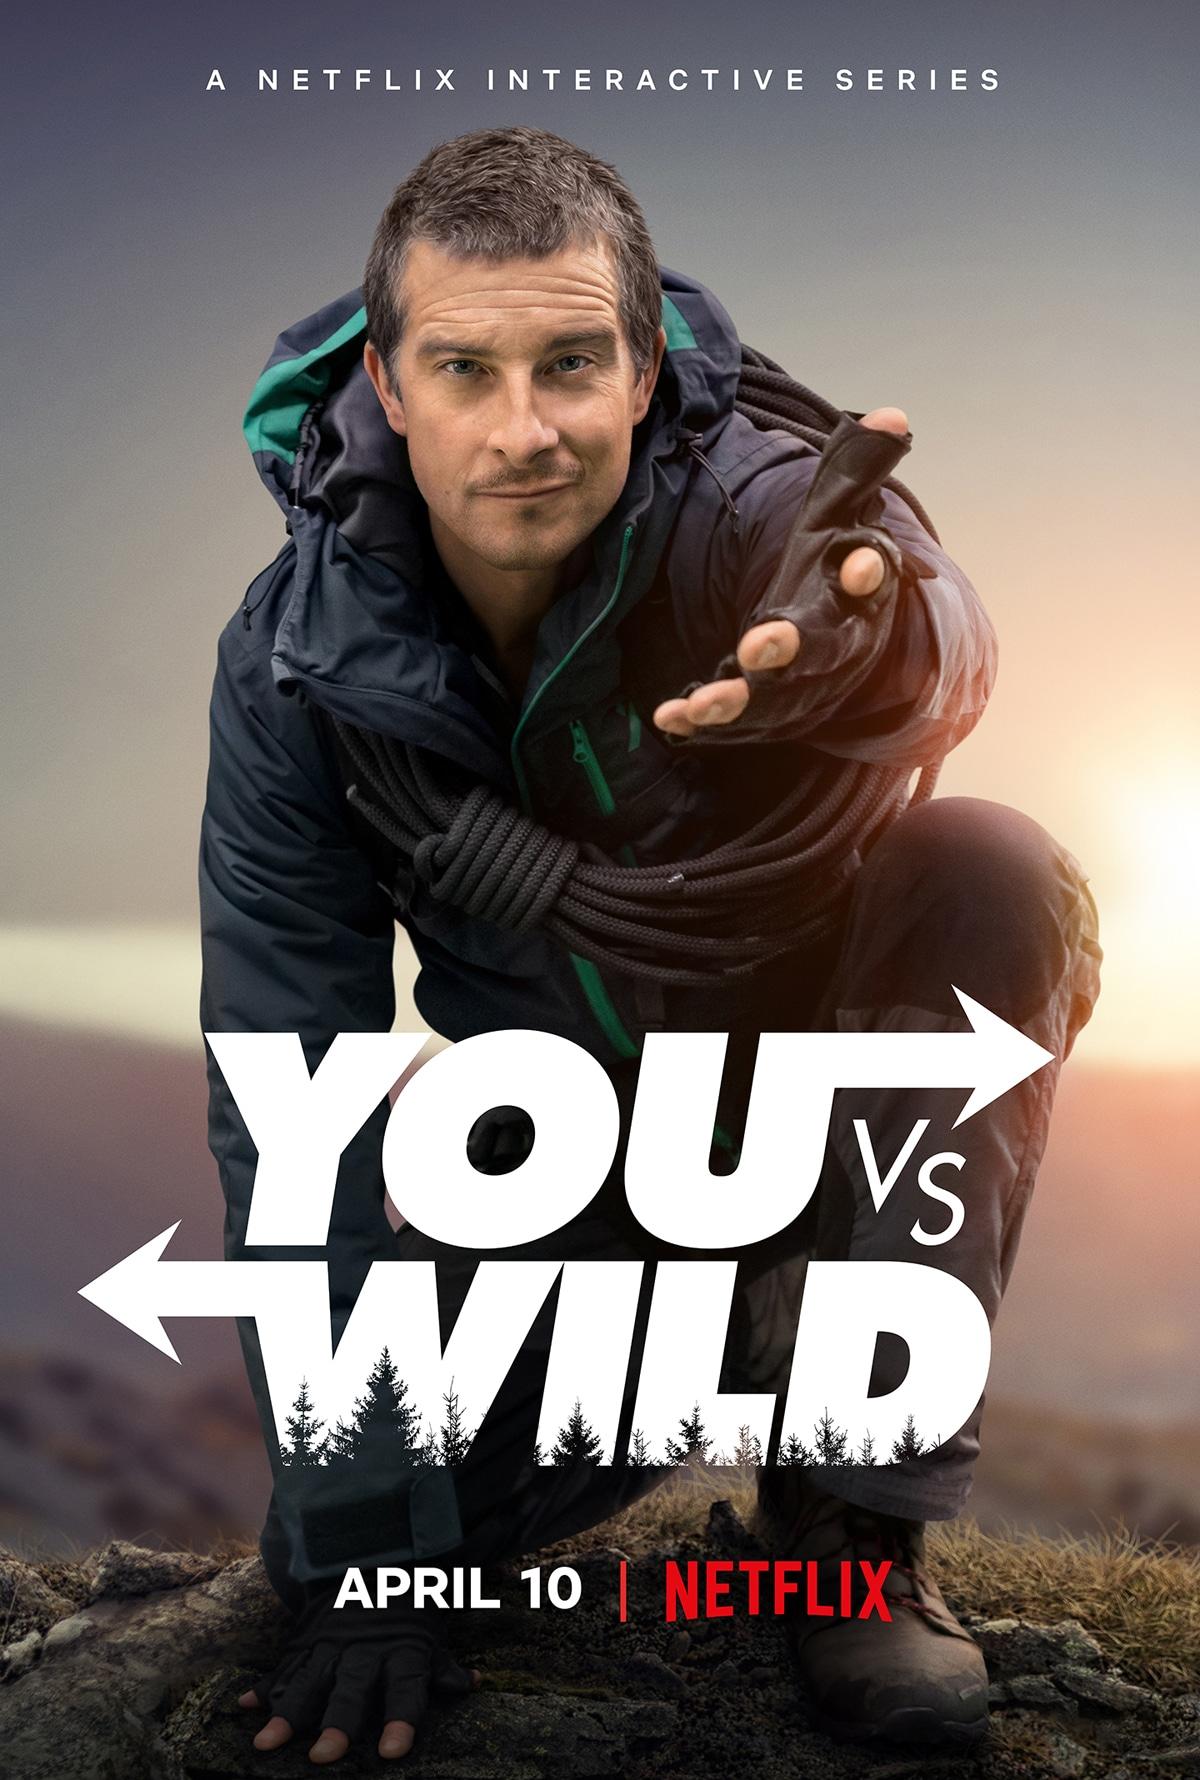 You vs. Wild Netflix with Bear Grylls trailer